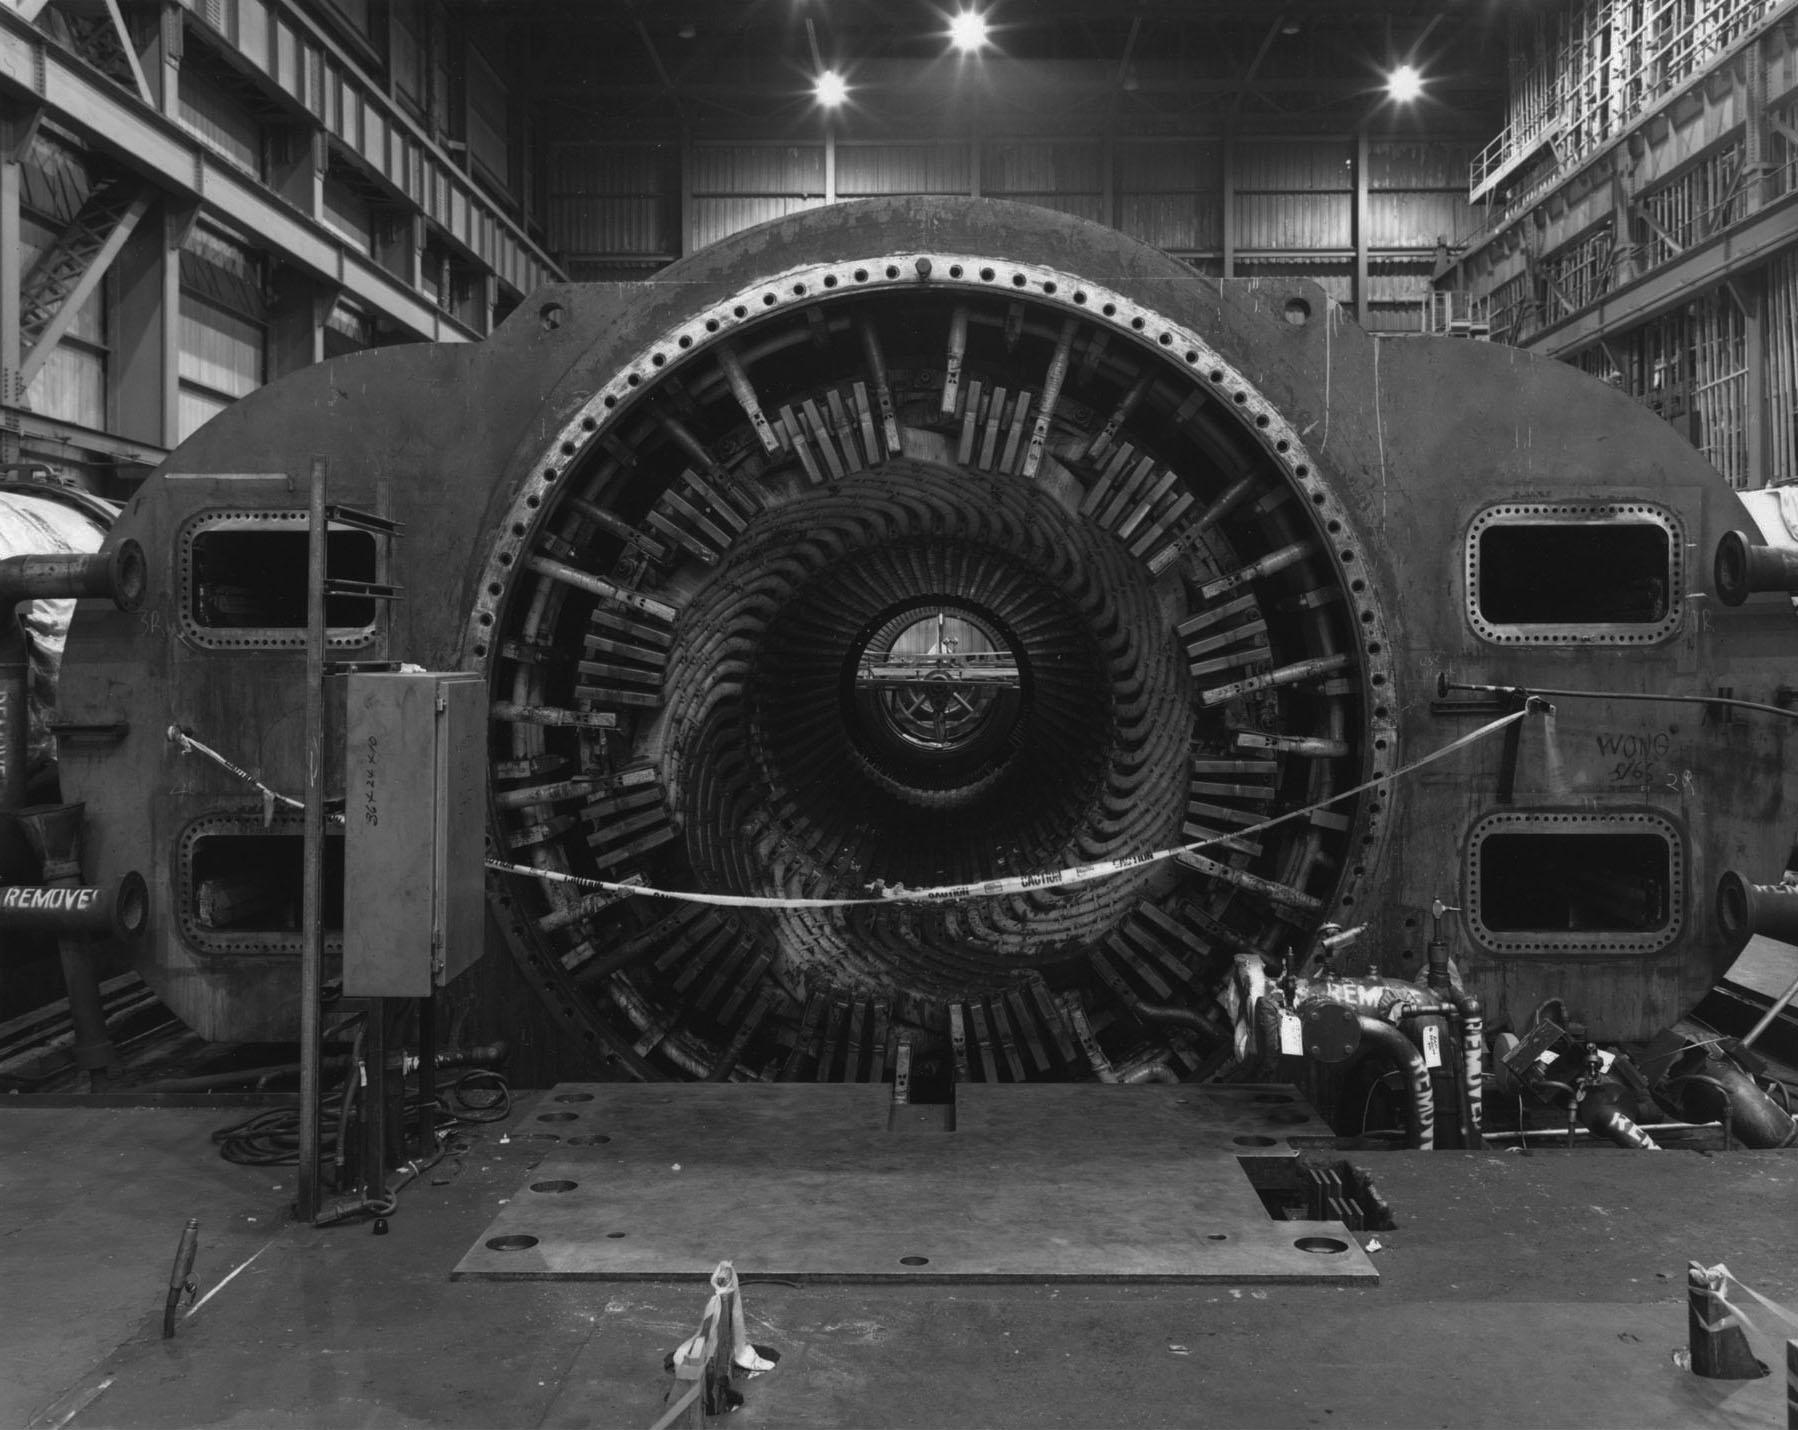 Turbine, Ravenswood Station, Queens, 1993